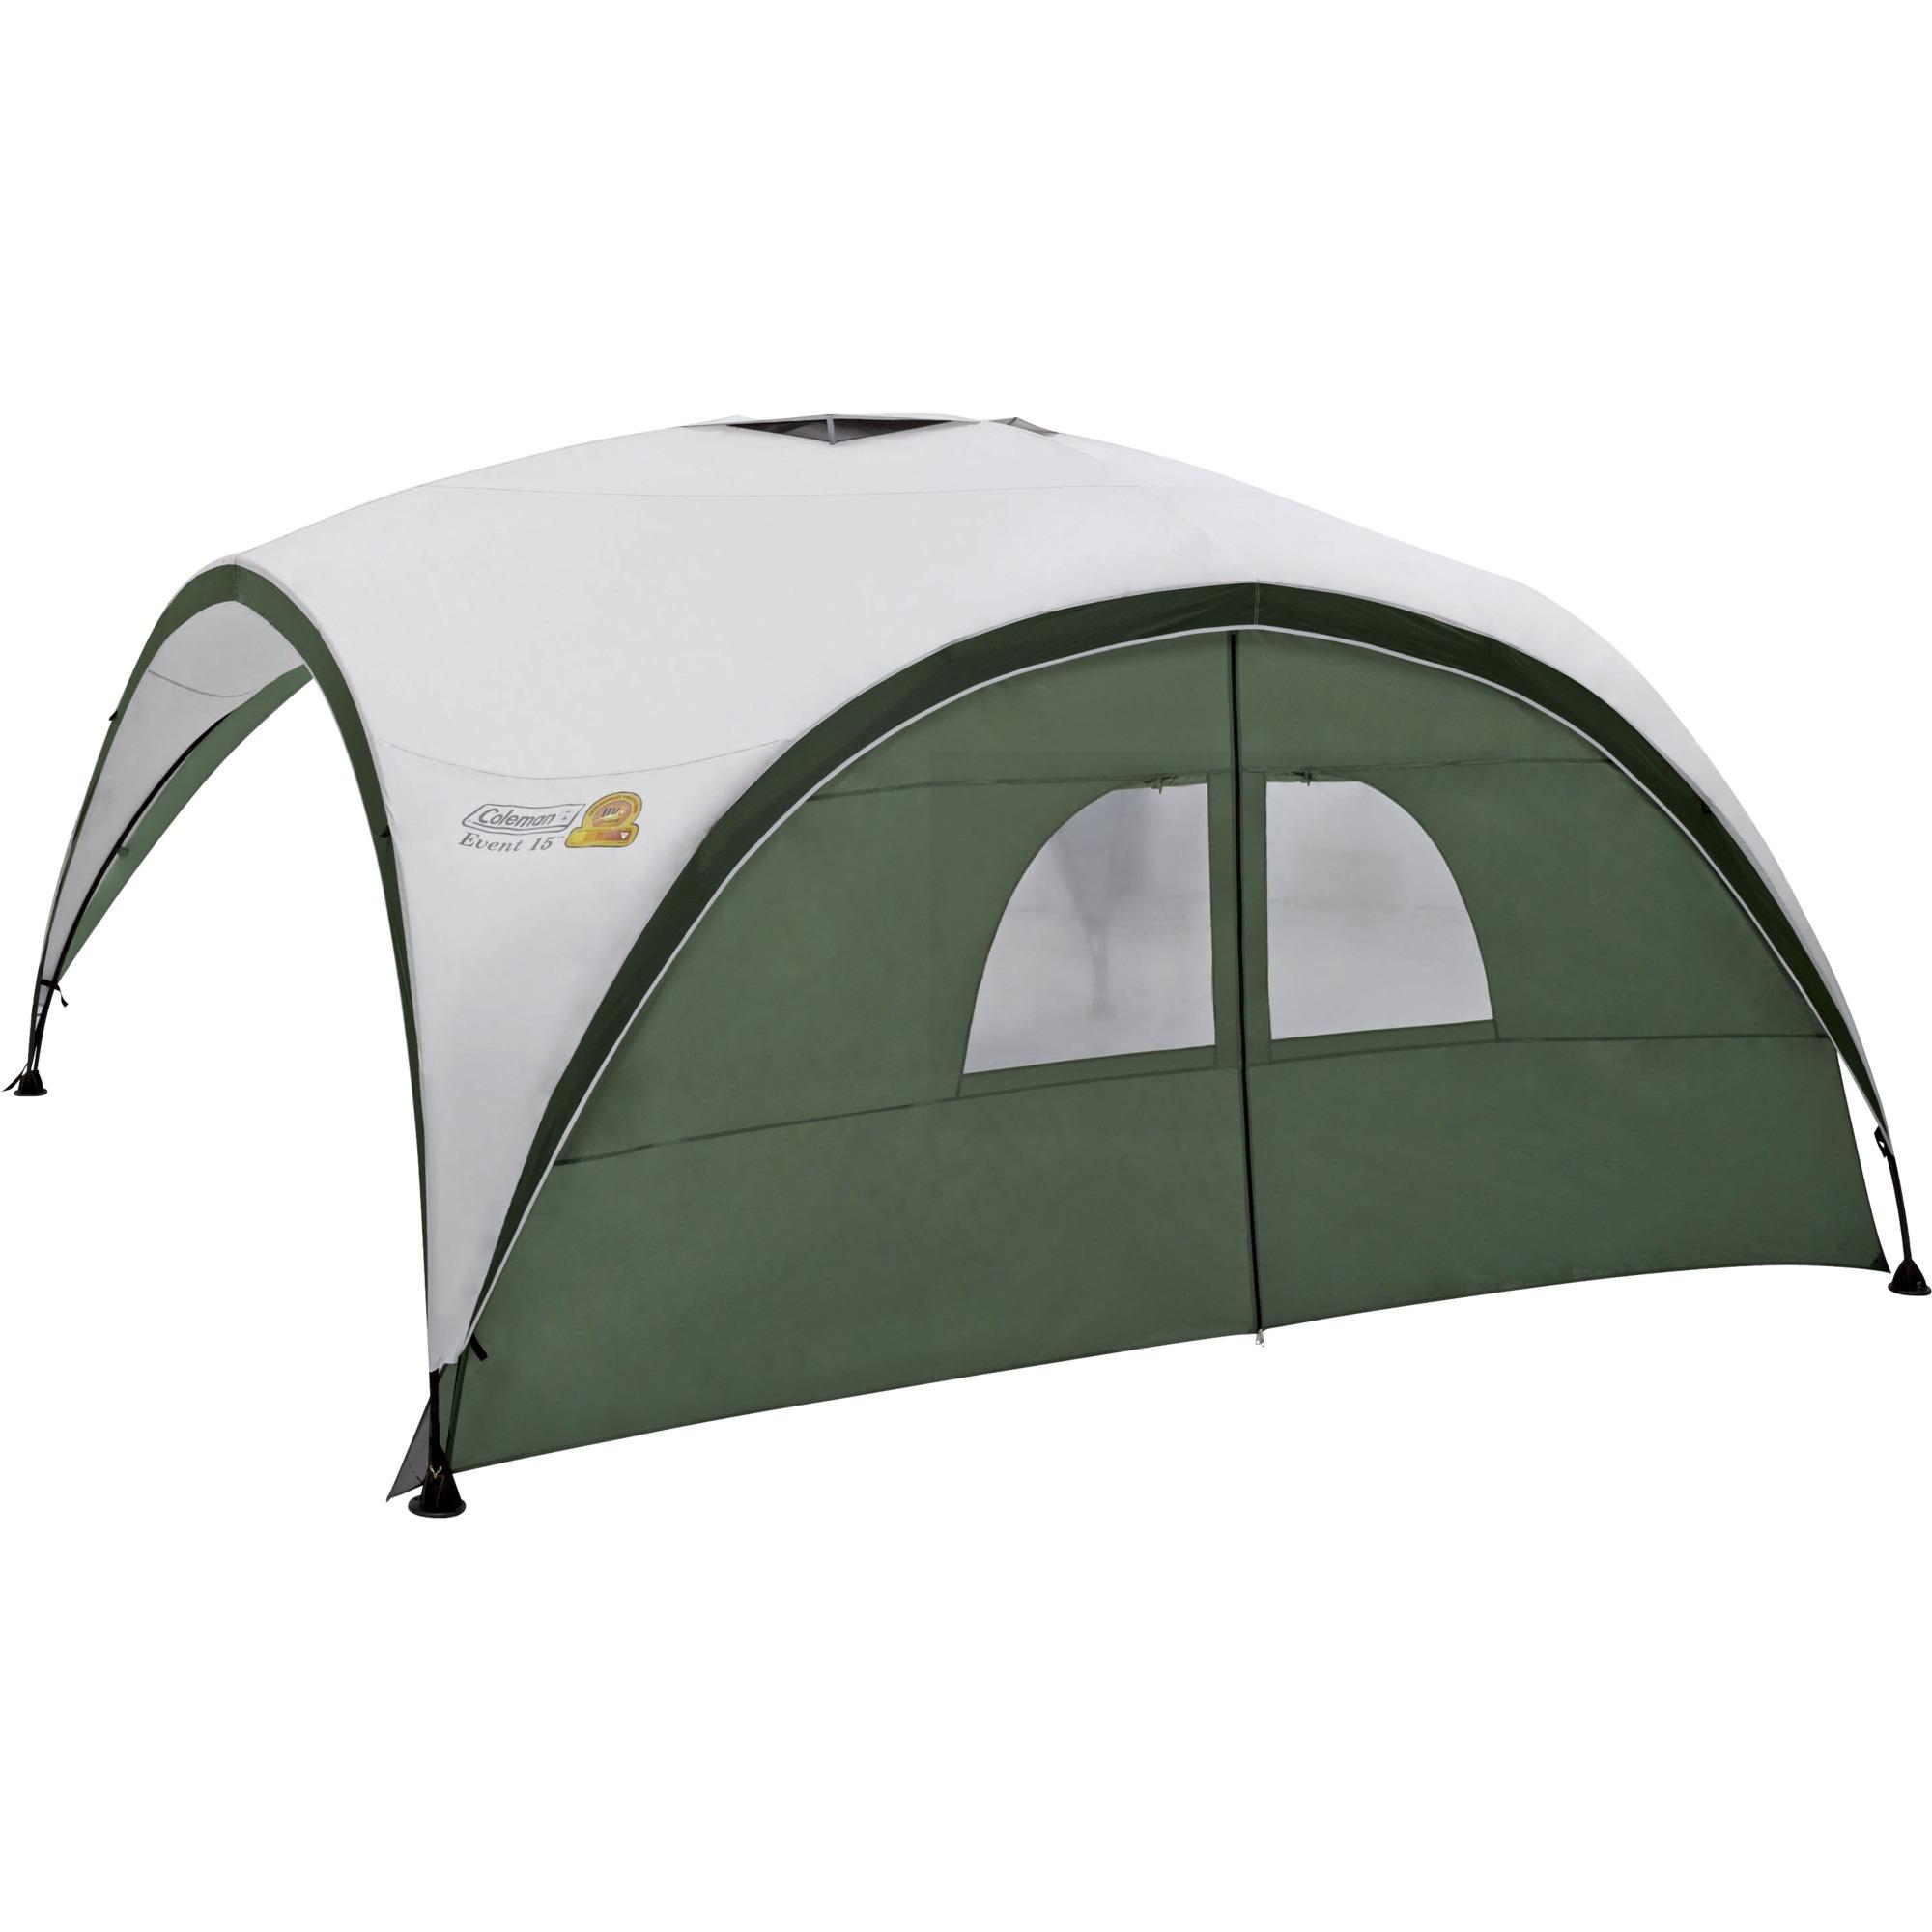 204503-camping-baldakin-sidedel